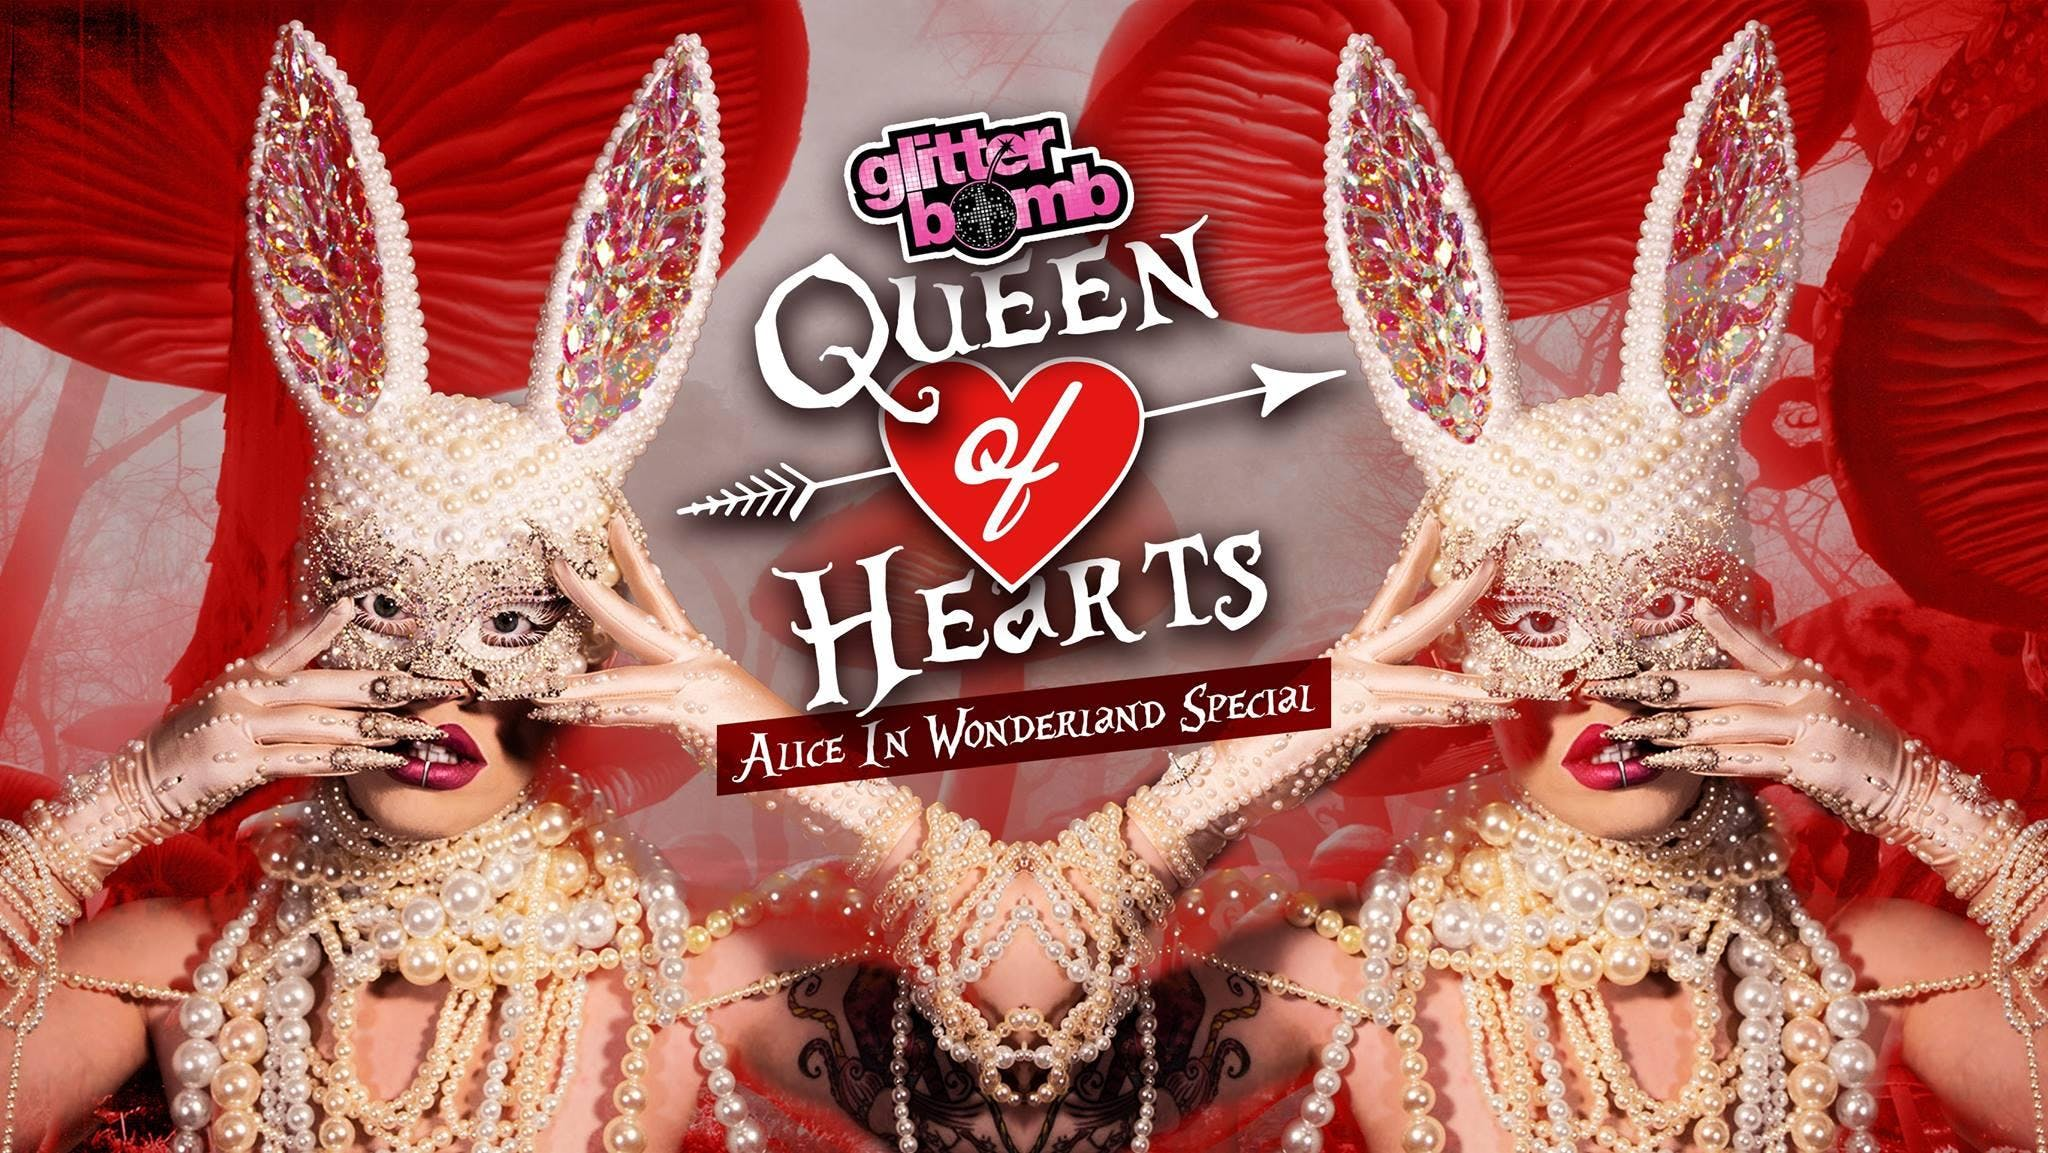 Queen of Hearts / Glitterbomb Cambridge